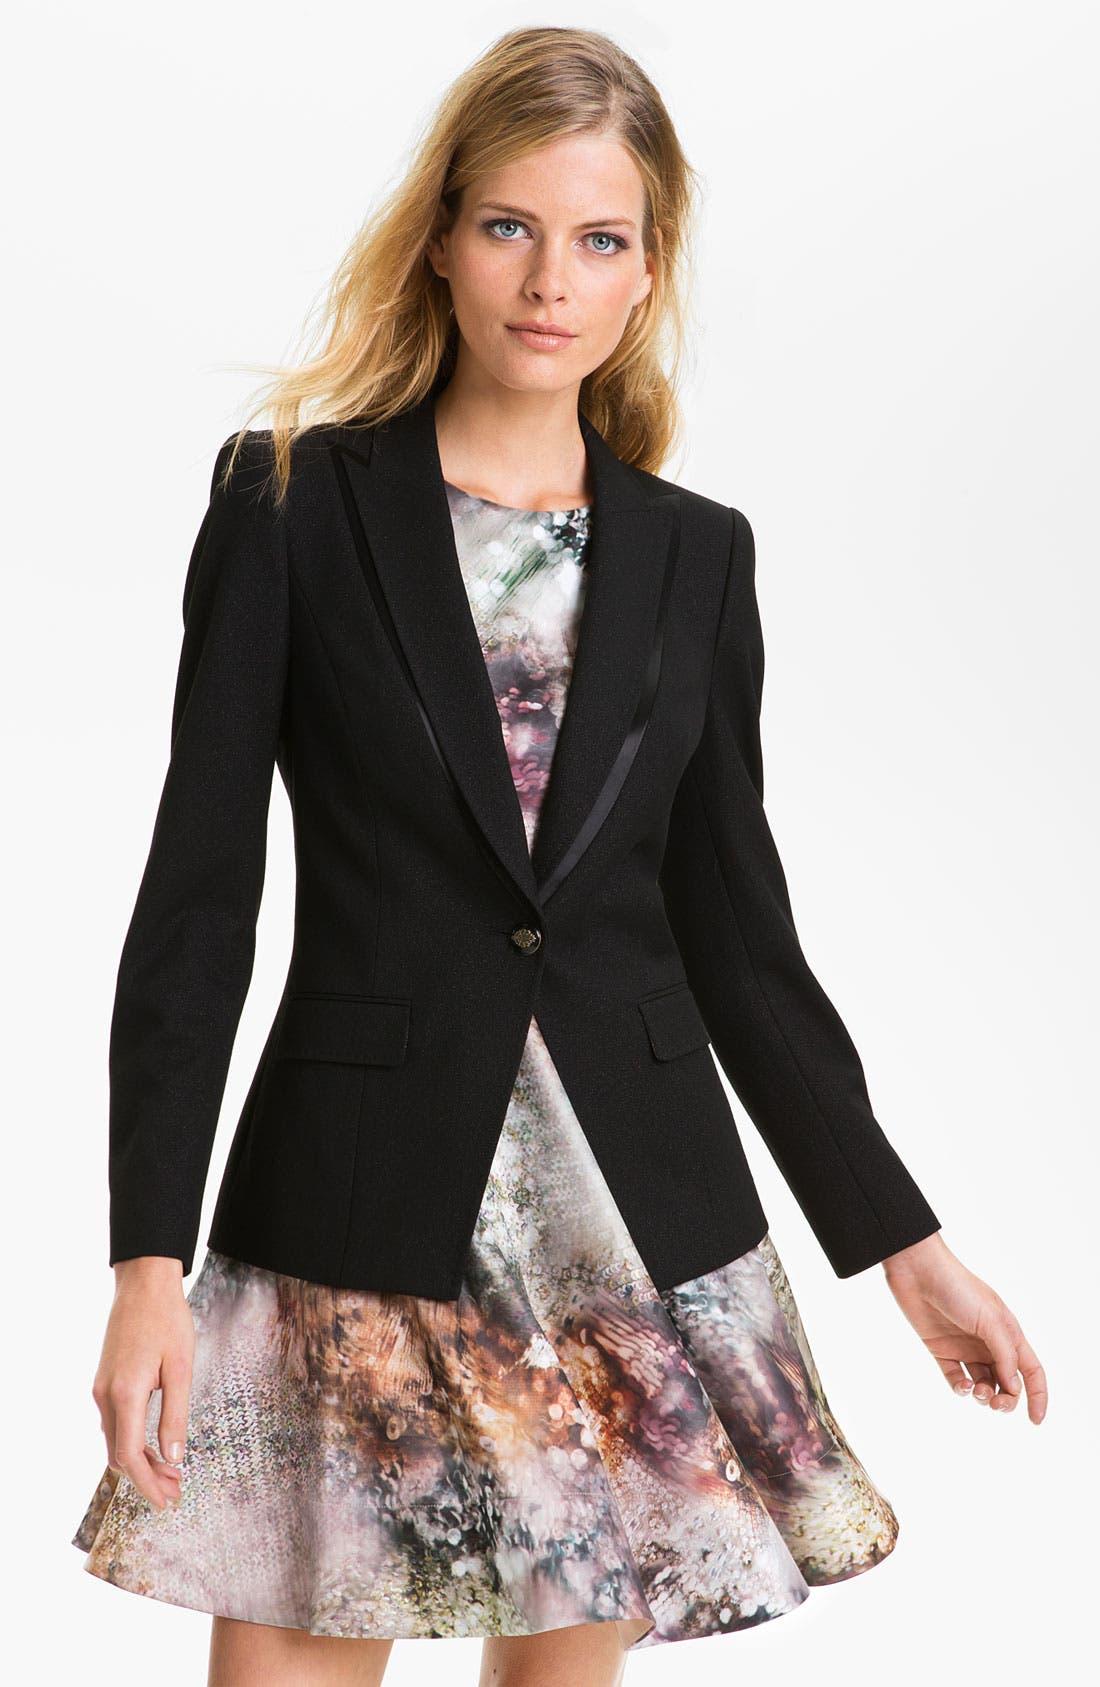 Main Image - Ted Baker London 'Mowna' Suit Blazer